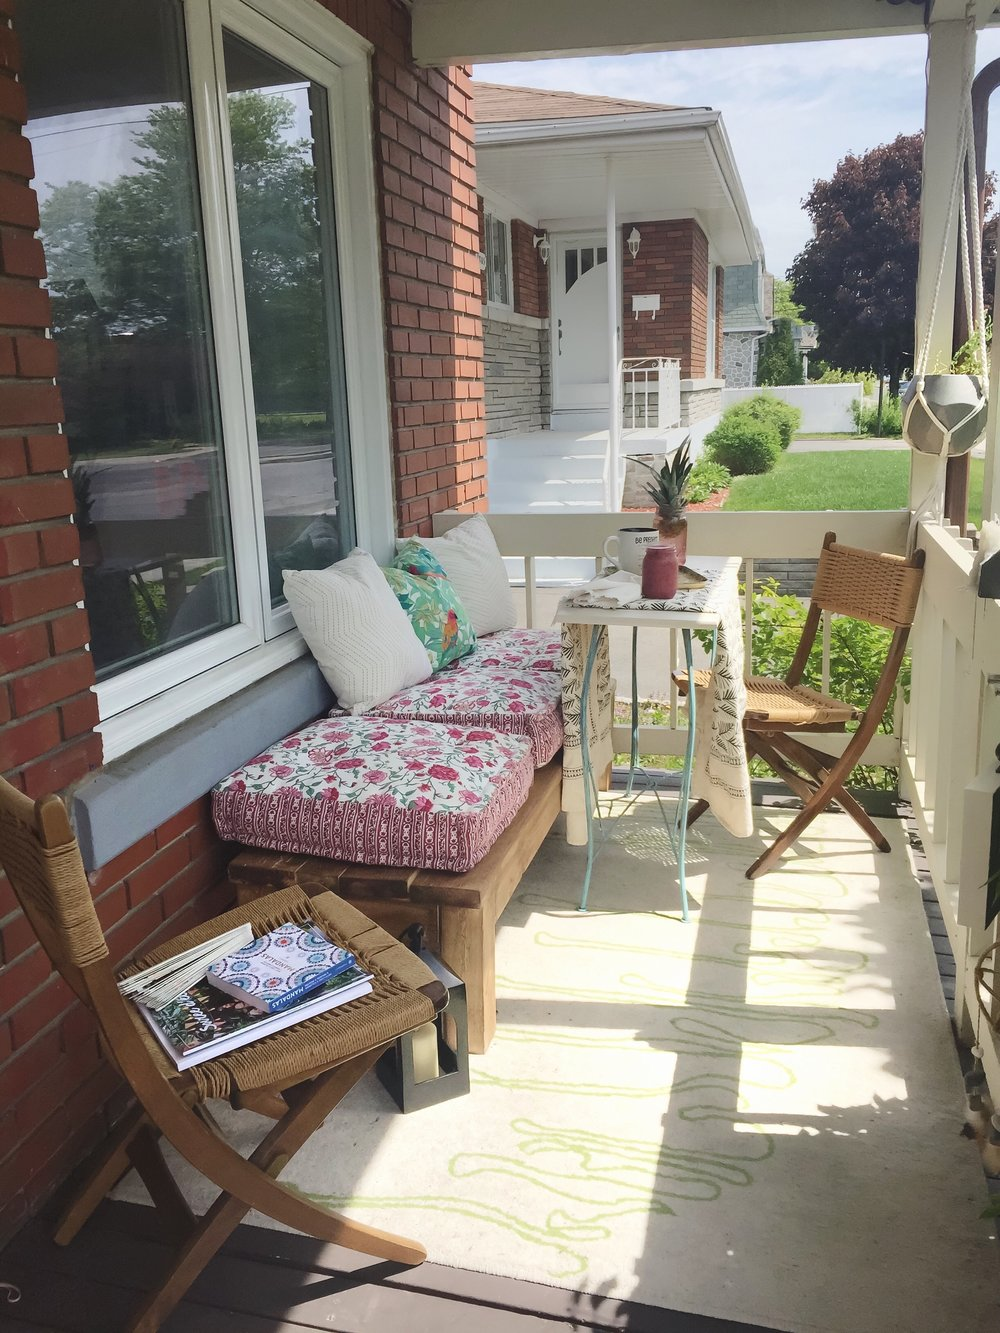 Aménager Terrasse, Aménager Balcon, Diy, Aménagement Petit Balcon, Aménagement  Balcon Terrasse